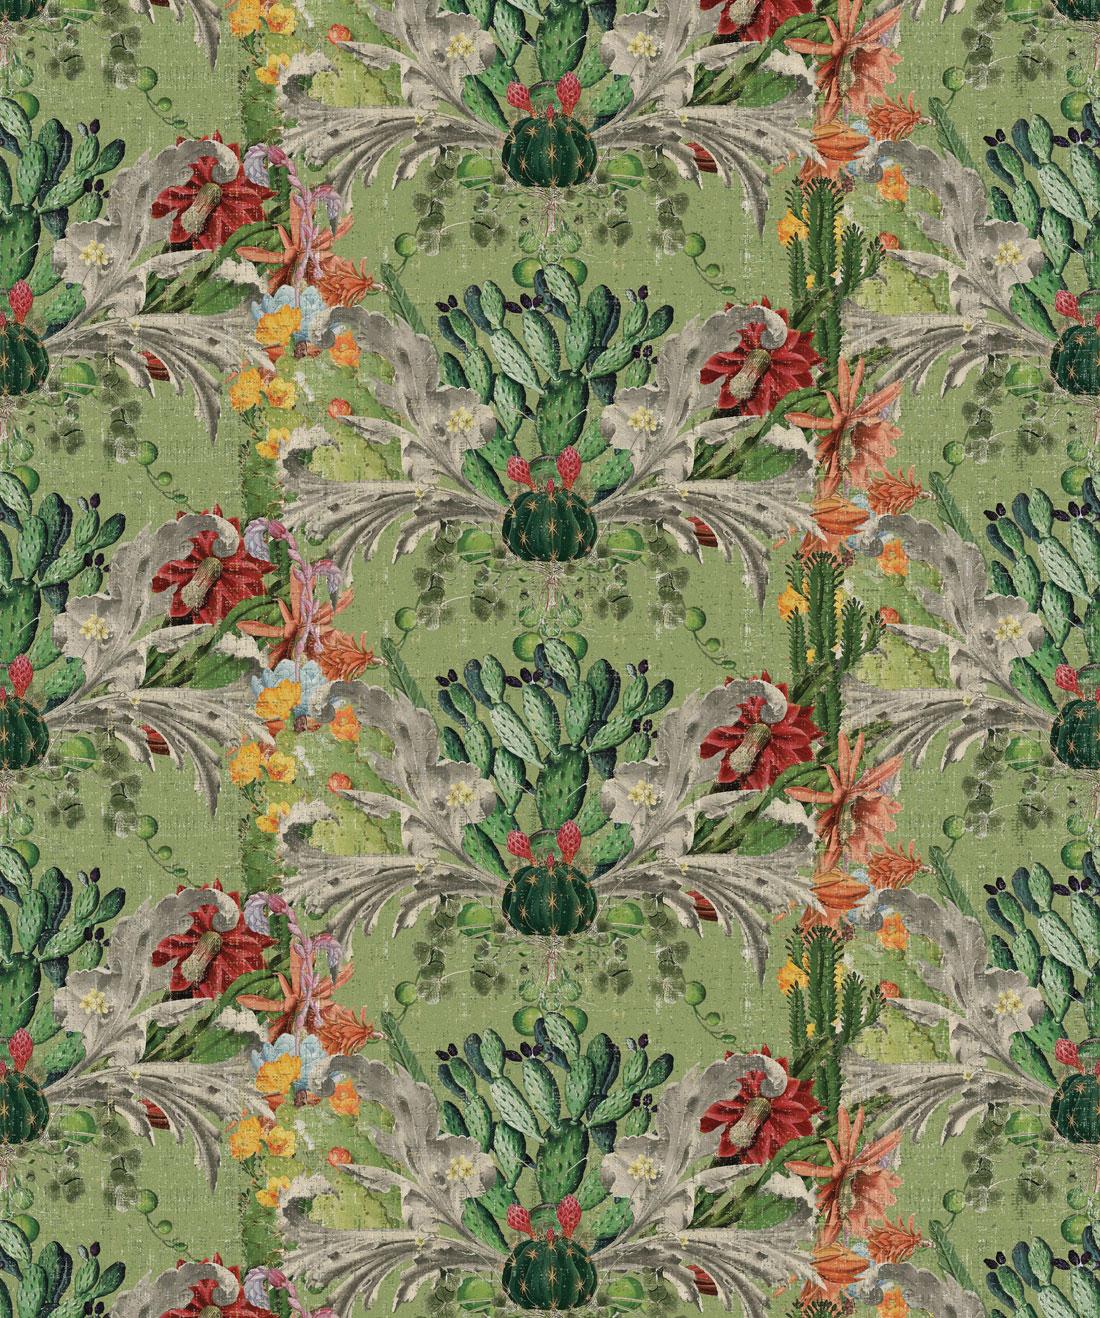 Cactus Wallpaper (Simcox)